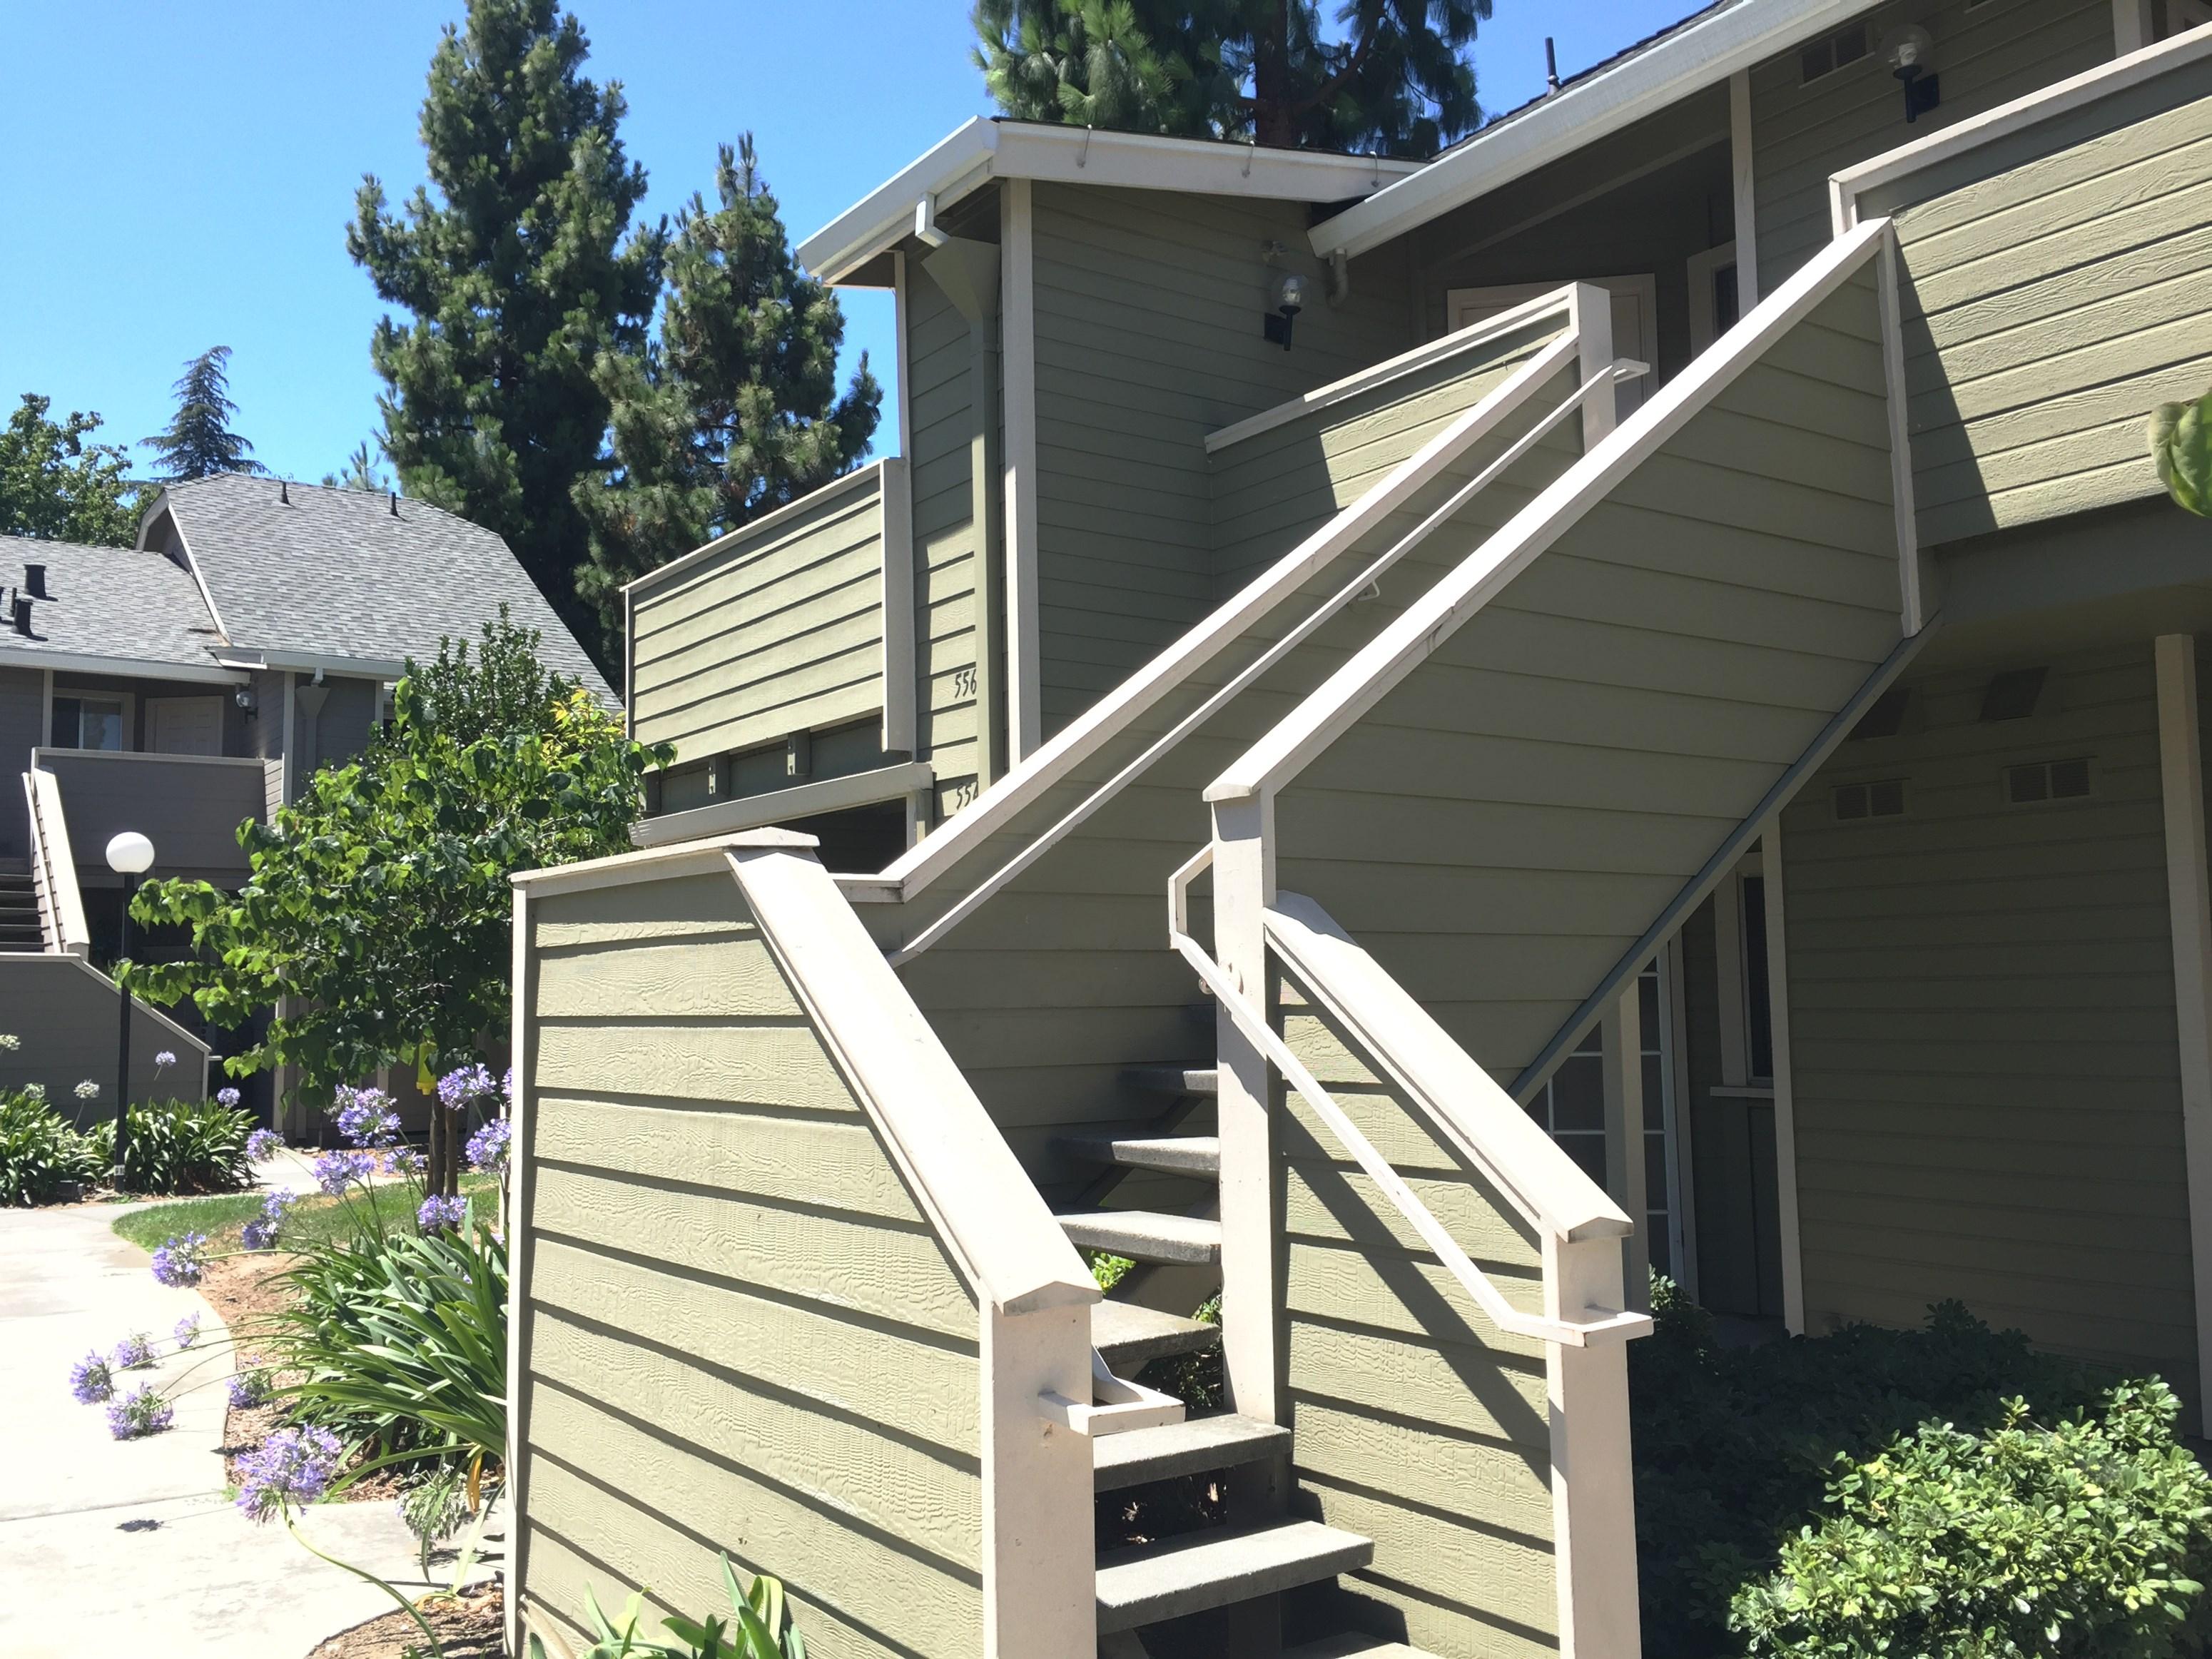 For Rent 2br 2ba Condo In San Jose Willow Glen Area